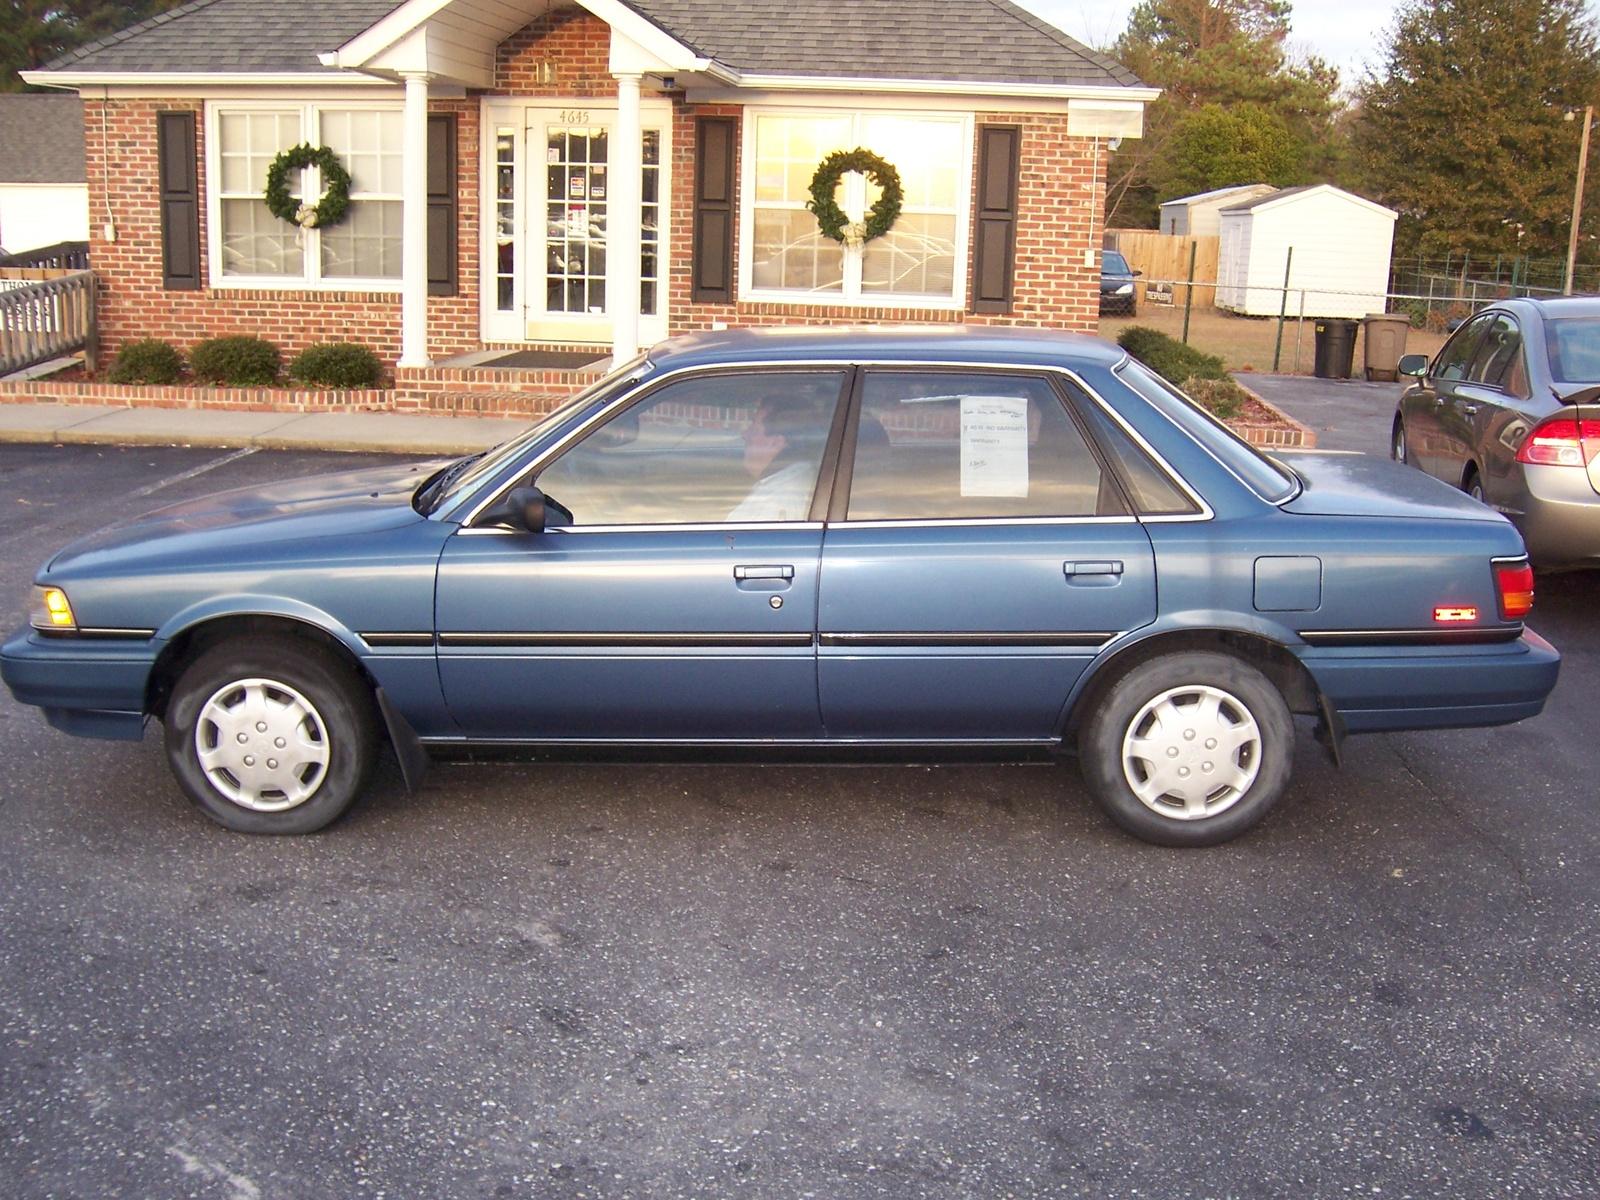 1991 Toyota Camry Pictures Cargurus